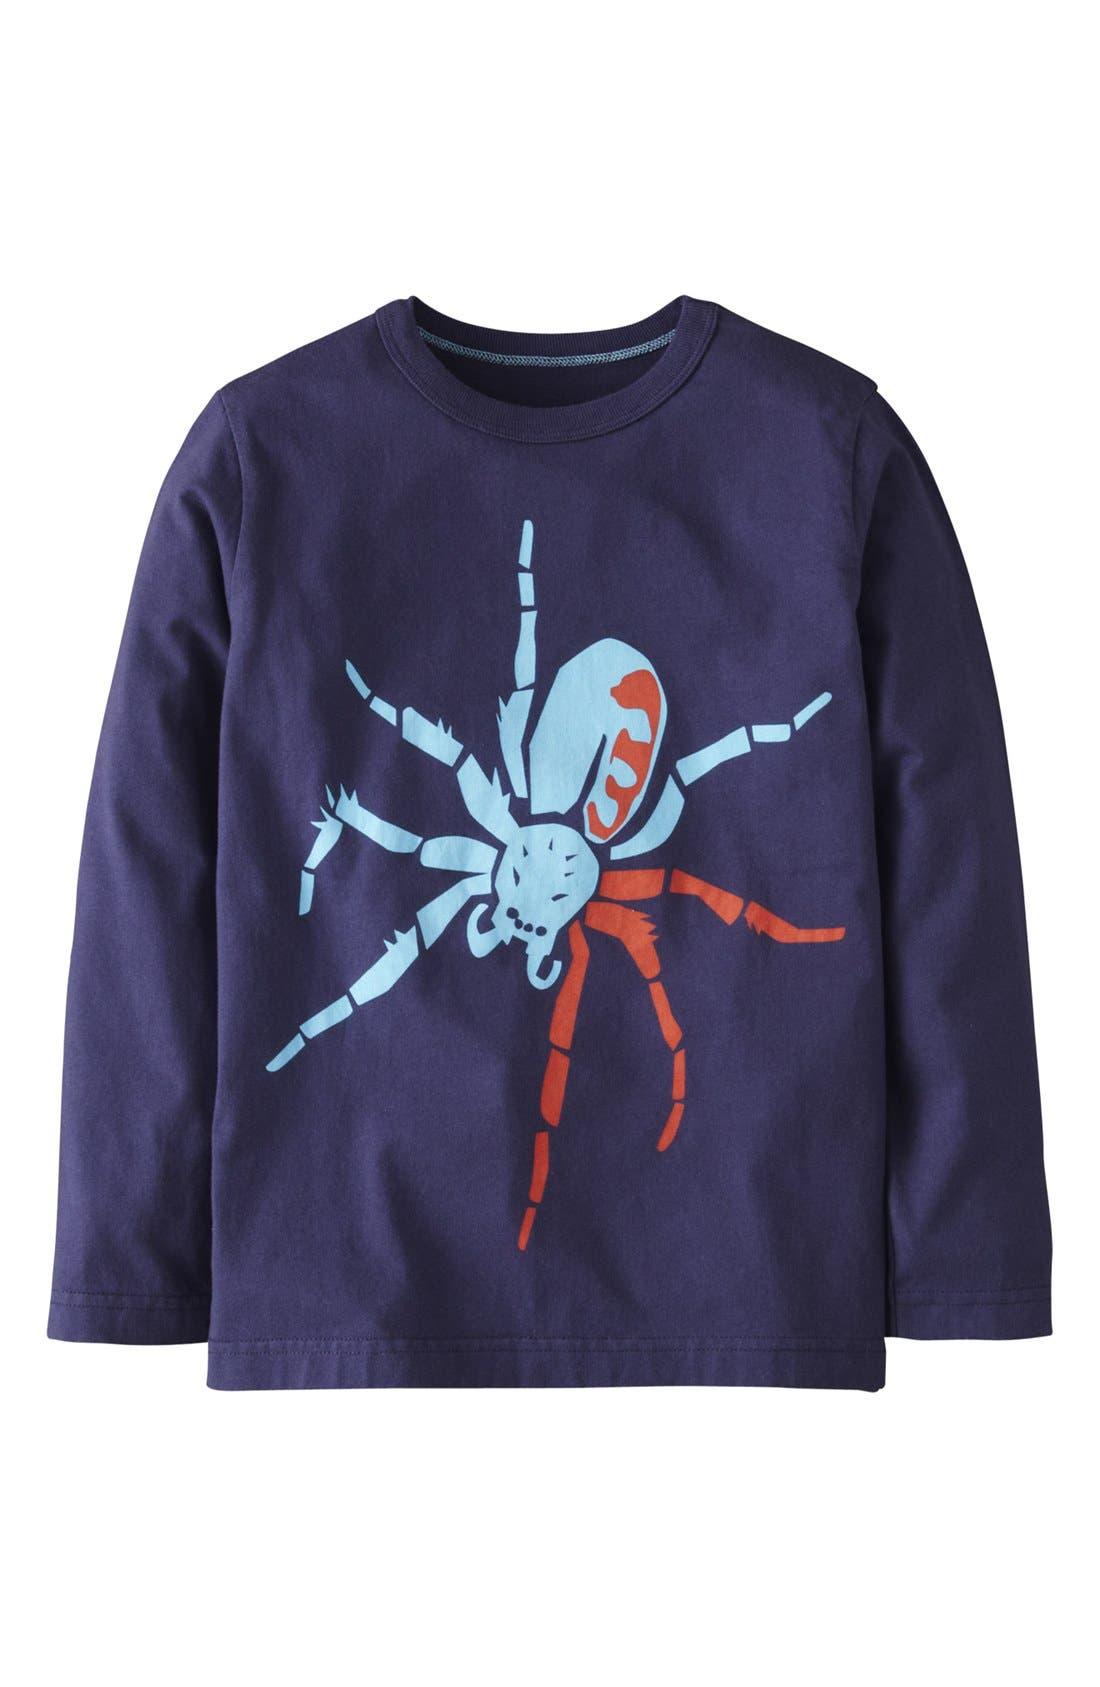 Main Image - Mini Boden 'Big Bugs' Long Sleeve T-Shirt (Toddler Boys)